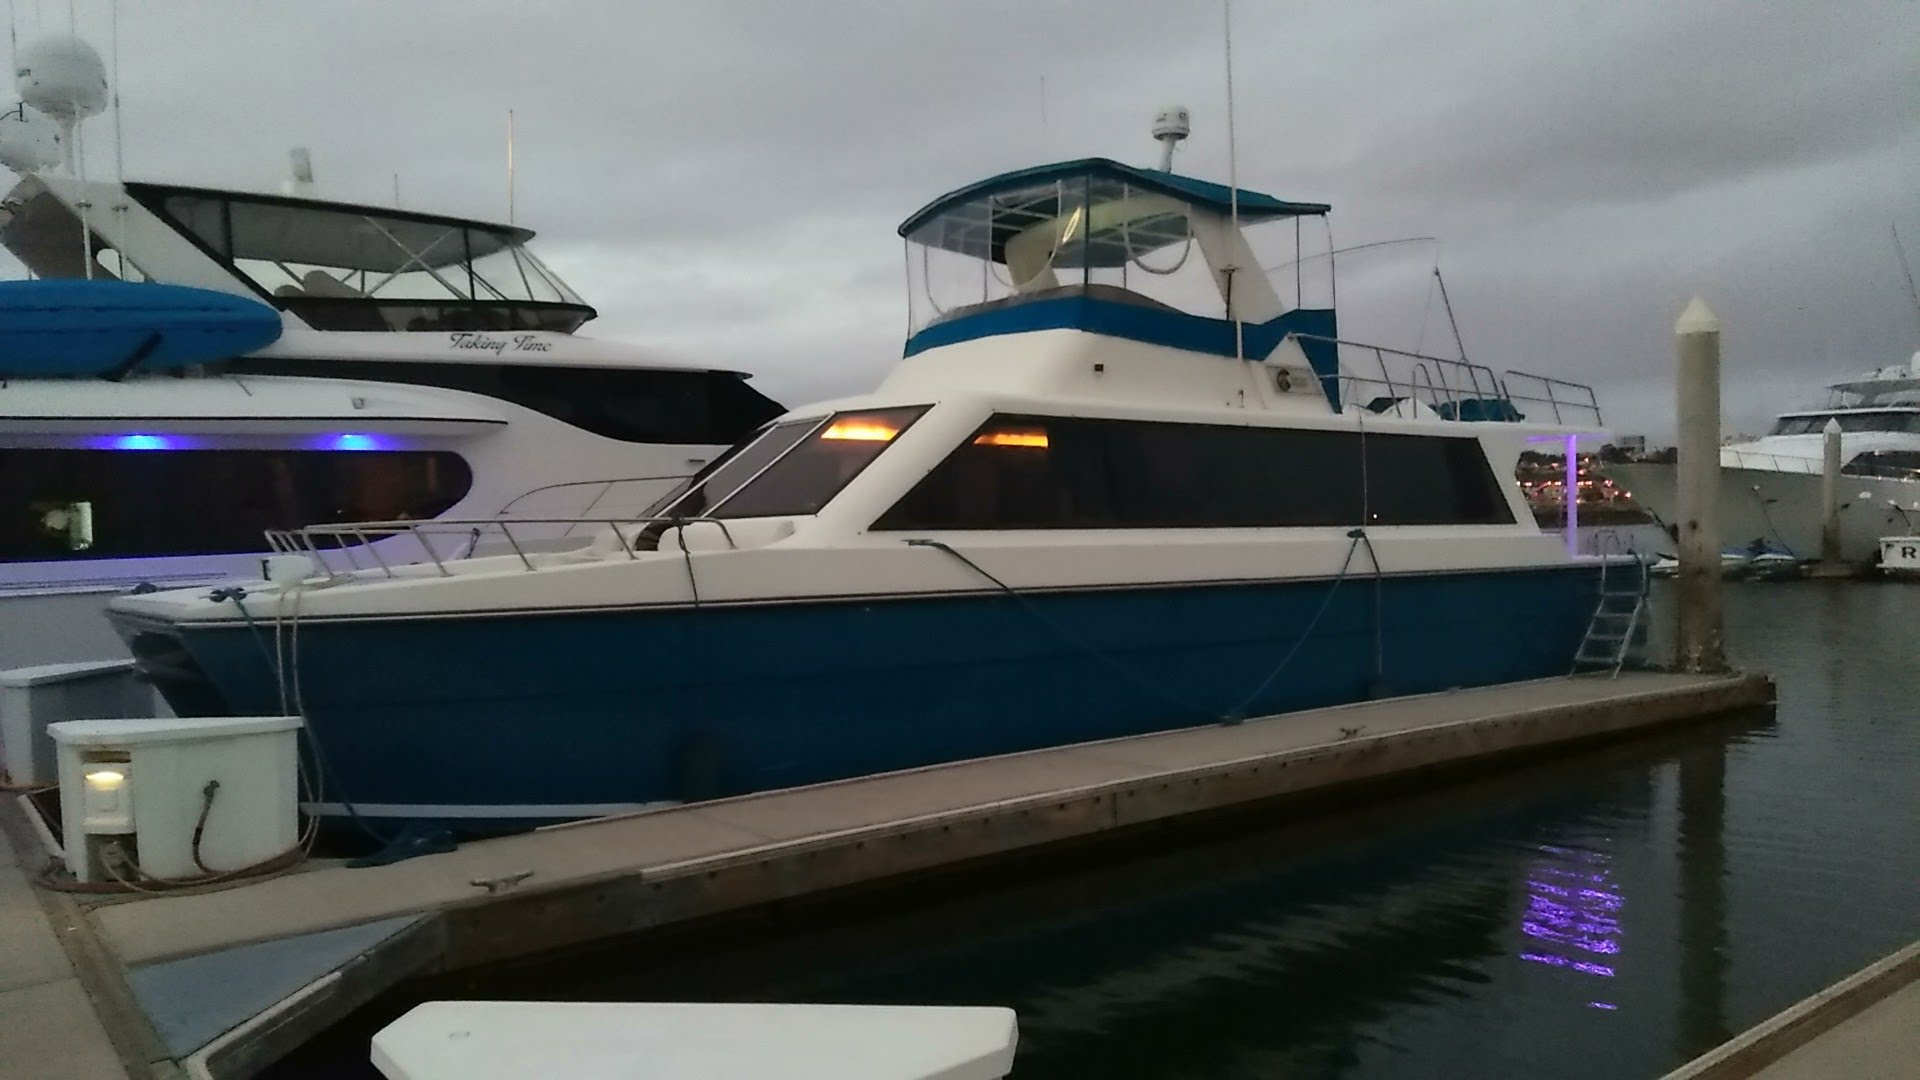 San Diego Yacht Charters, San Diego Booze Cruise, San Diego Catamaran Rental, mai tai yacht charters, san diego party boat,